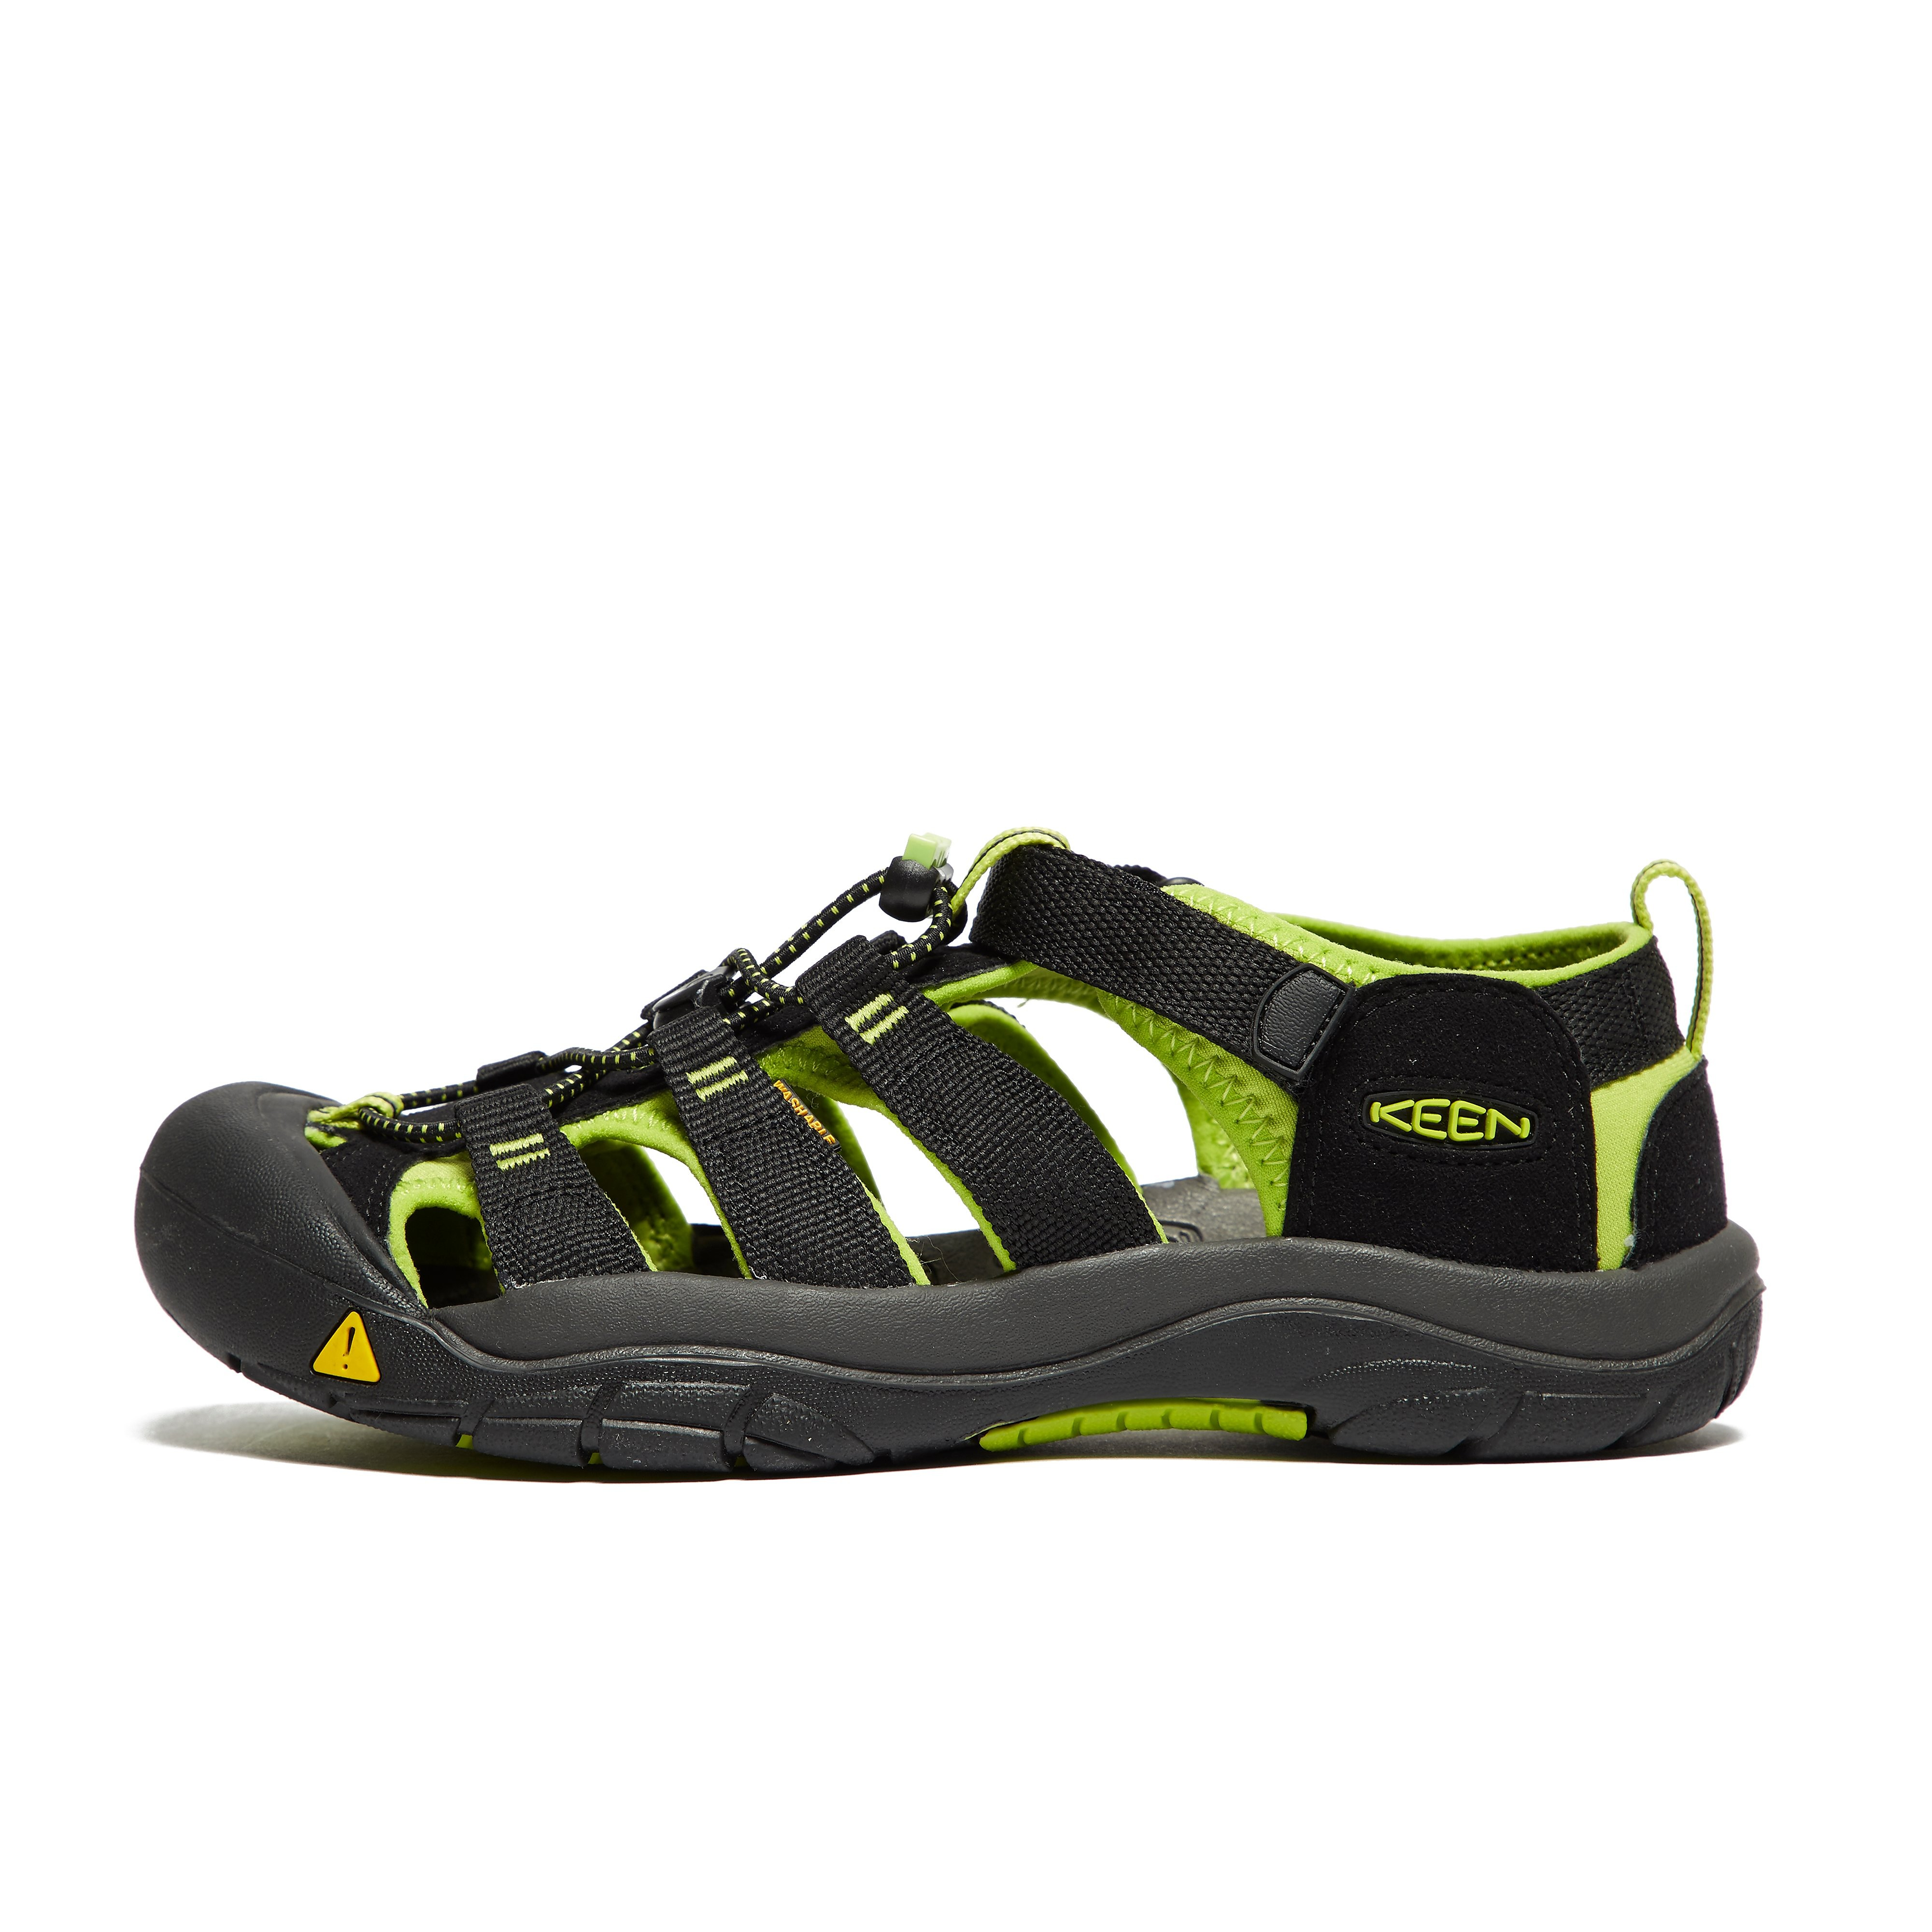 Keen Newport H2 Women's Sandals